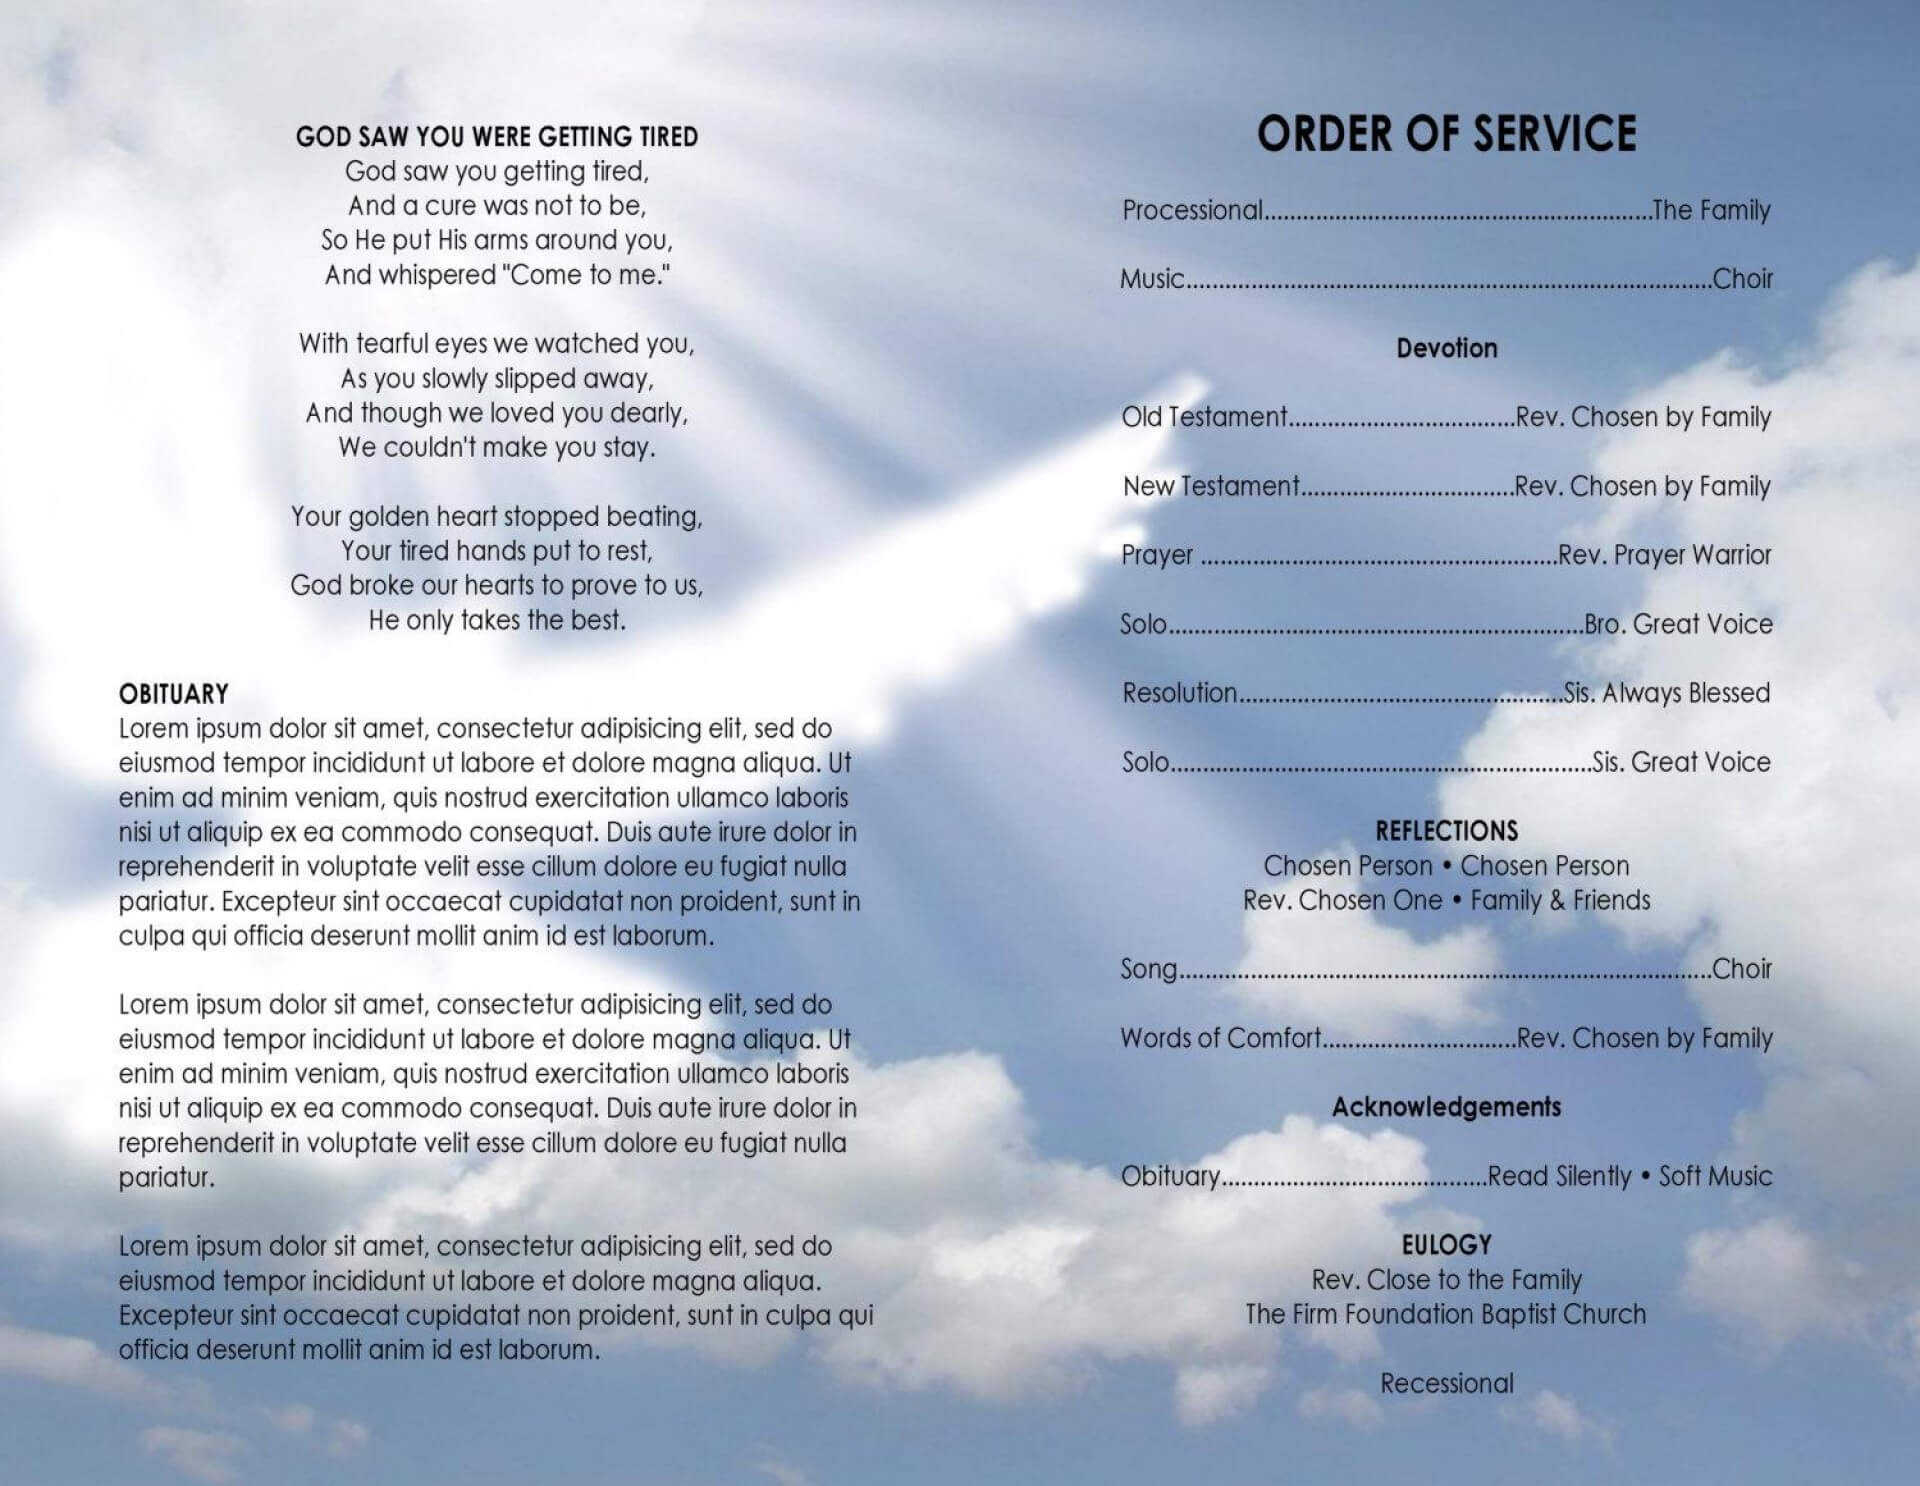 020 Template Ideas Free Blank Church Program Templates With Regard To Church Program Templates Word